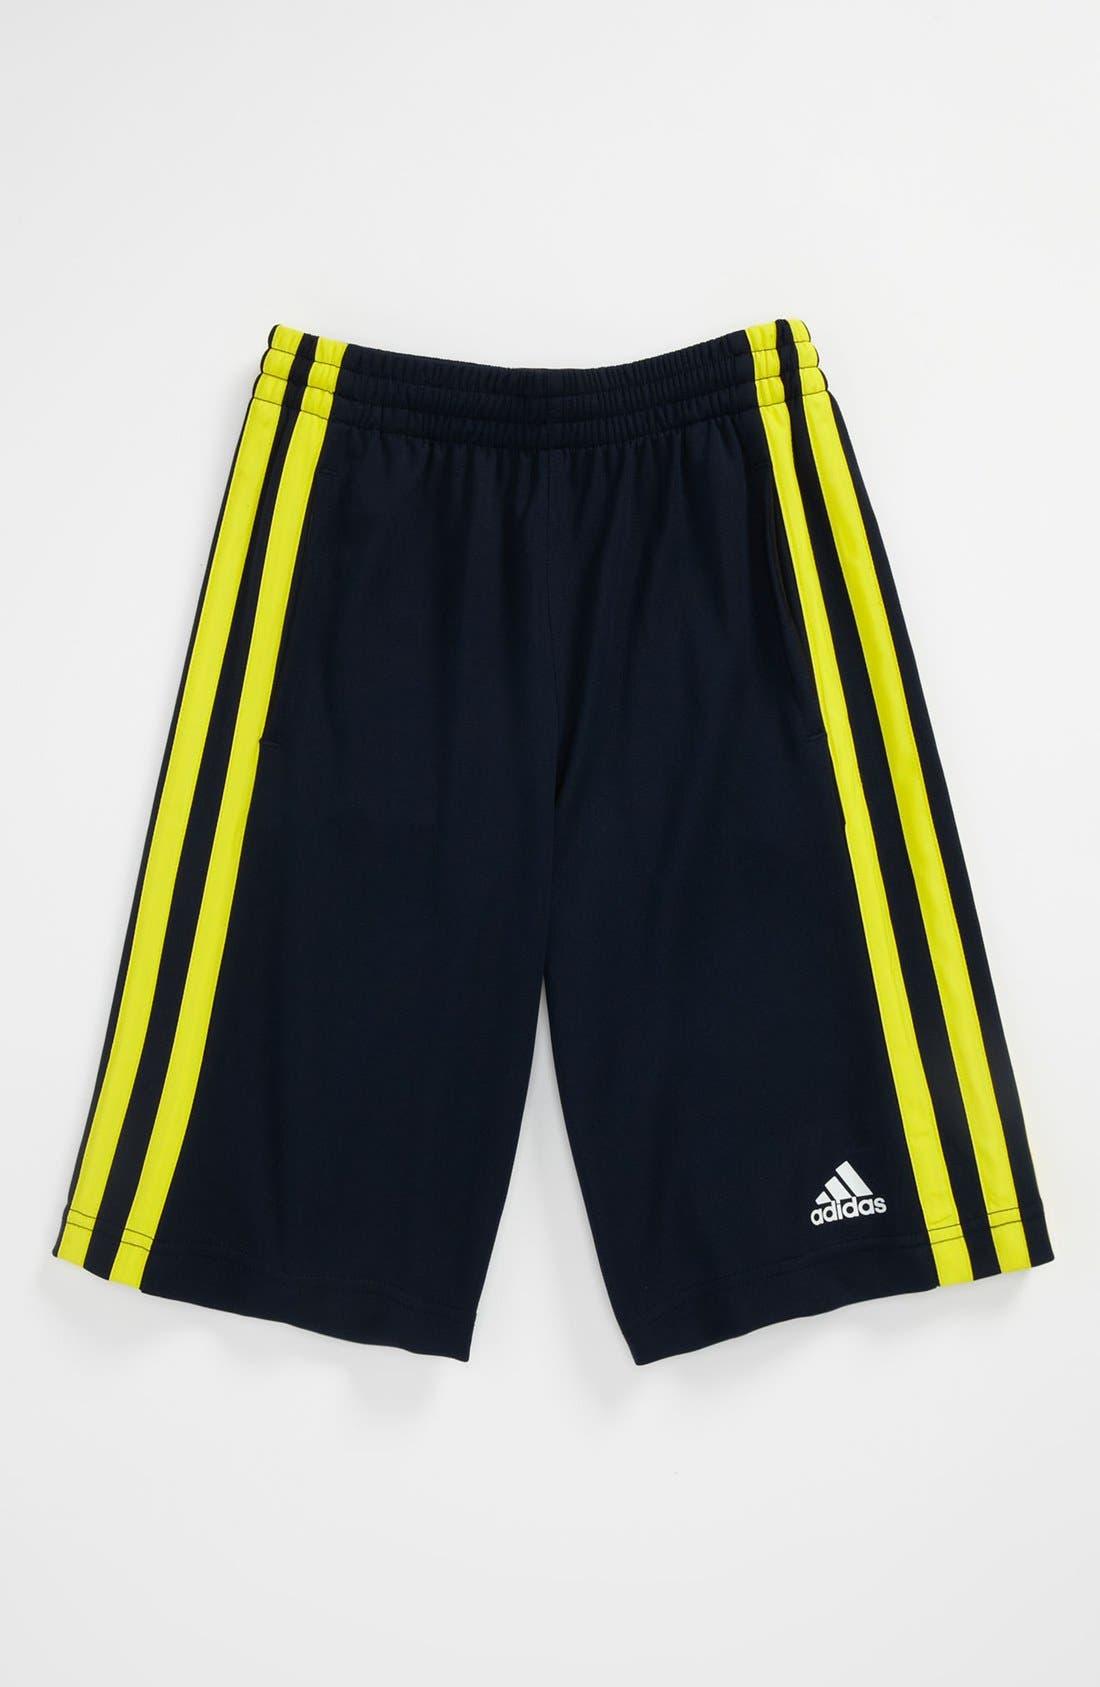 Alternate Image 1 Selected - adidas 'Fat Stripes' Shorts (Big Boys)